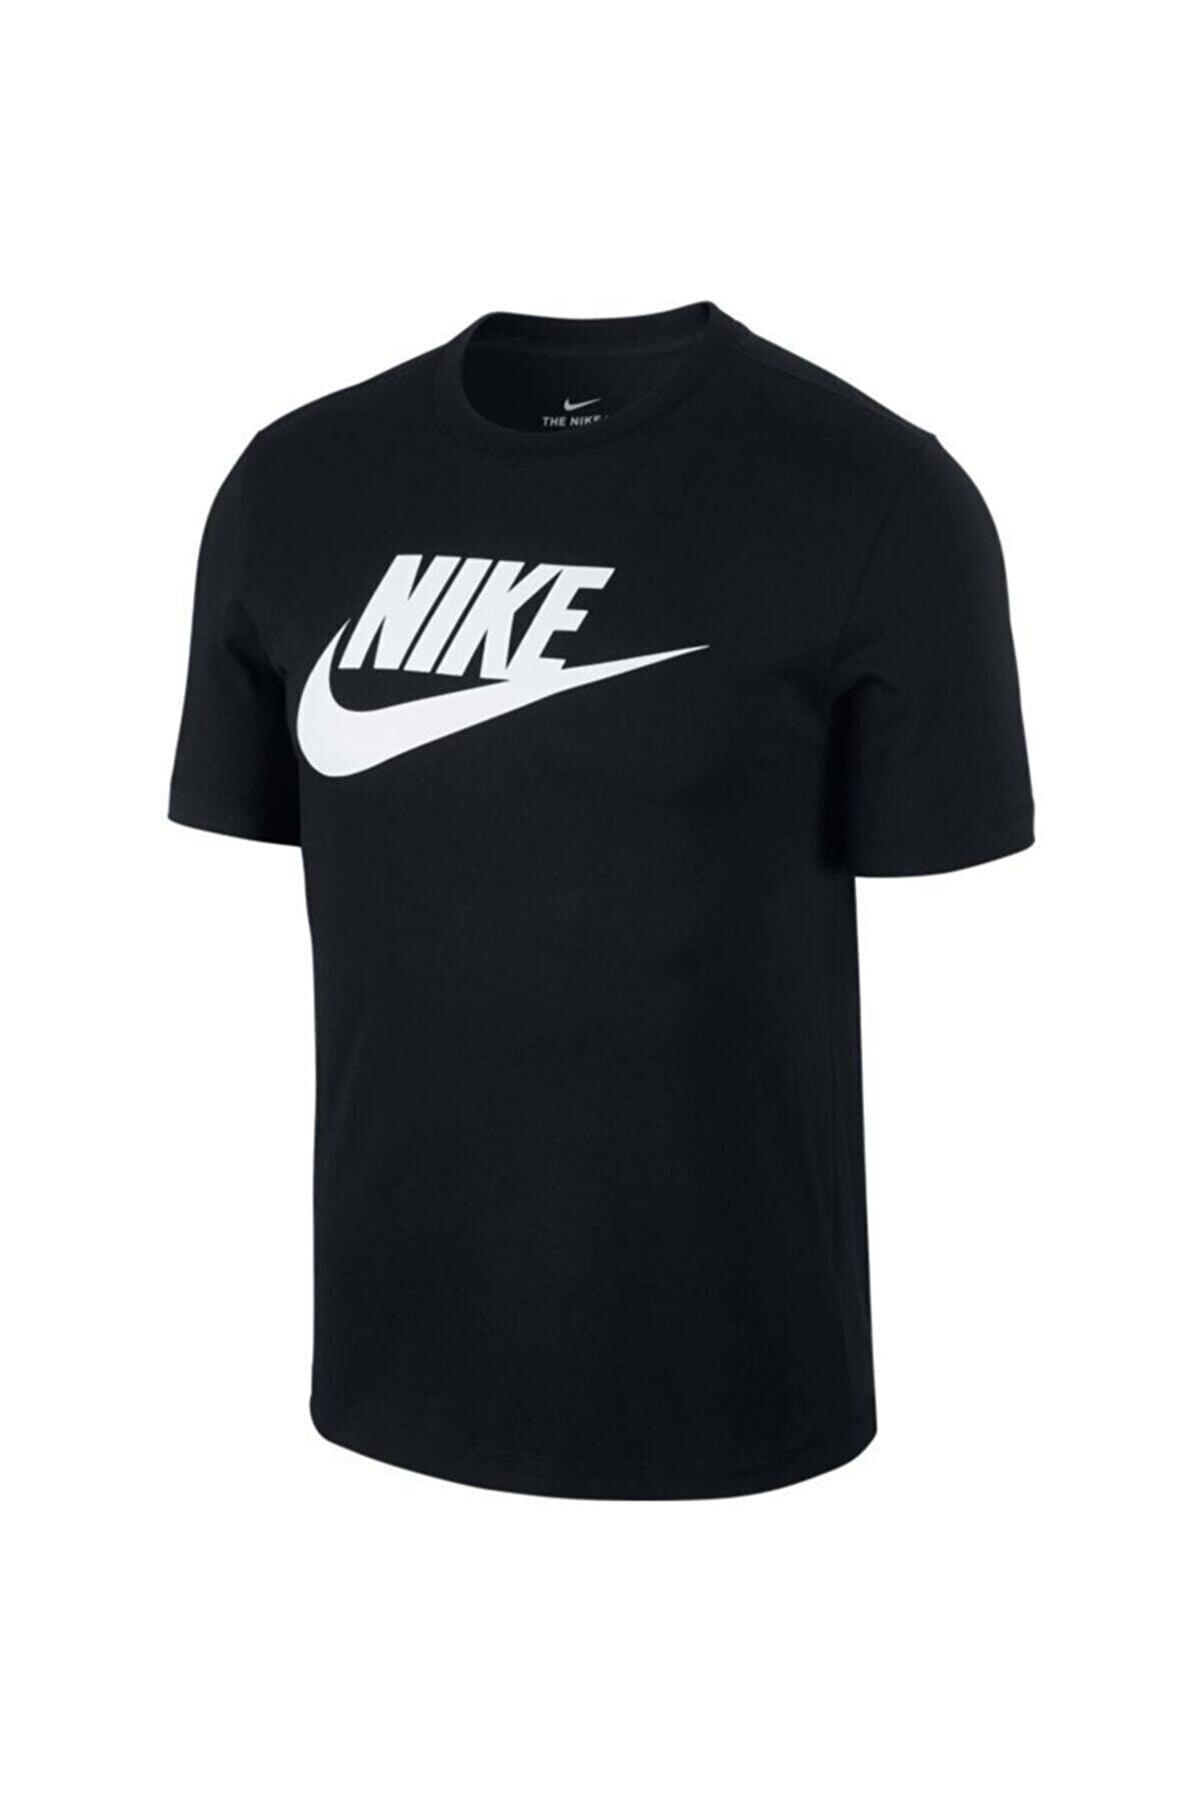 Nike Erkek Siyah Tişört Ar5004-010